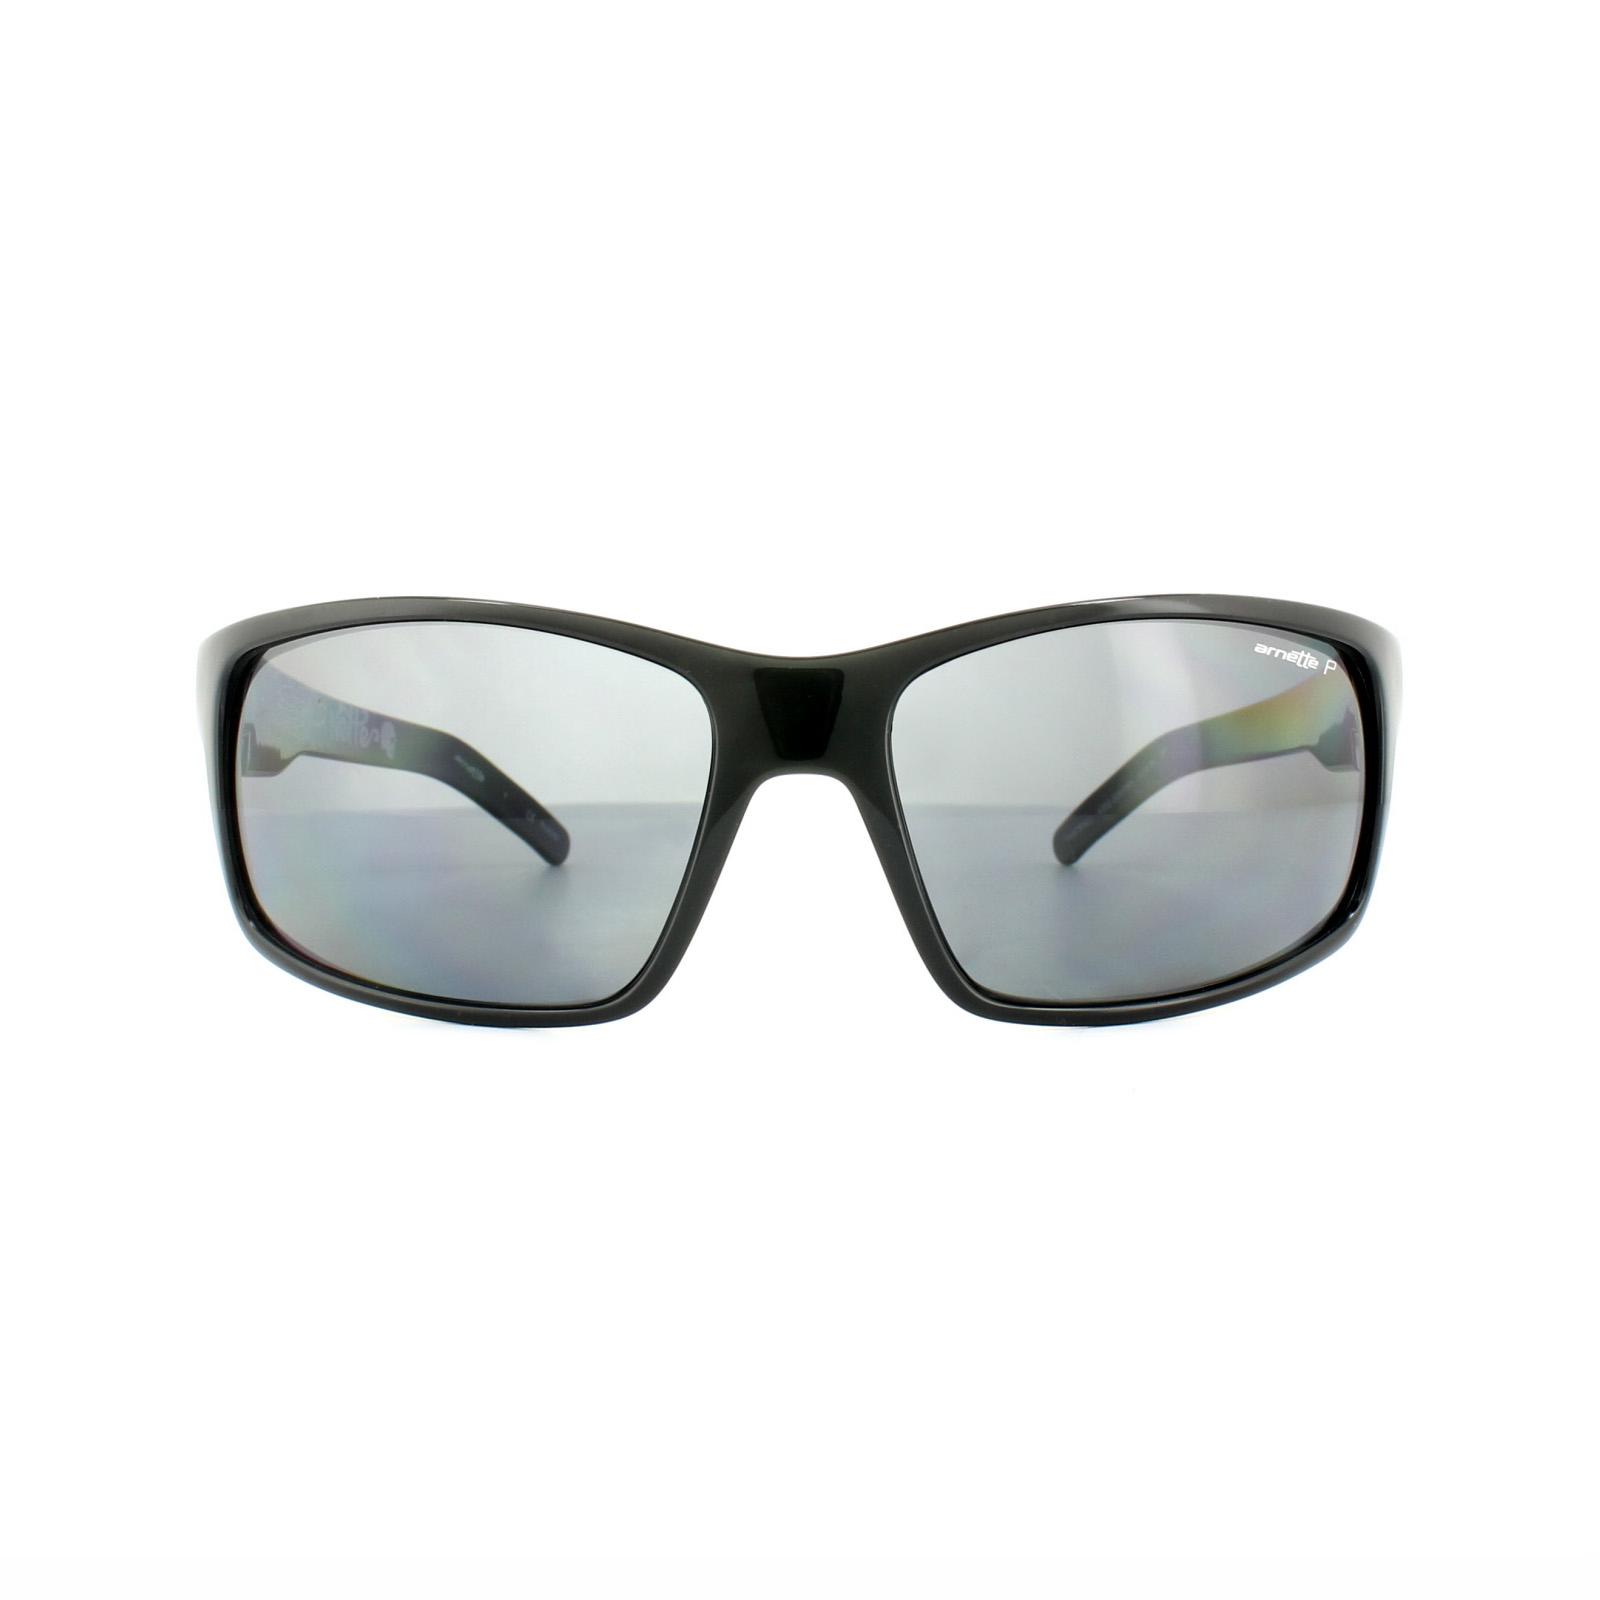 a6a65cb787a Sentinel Thumbnail 2. Sentinel Arnette Sunglasses Fastball 4202 226781  Black on Graphics Grey Polarized